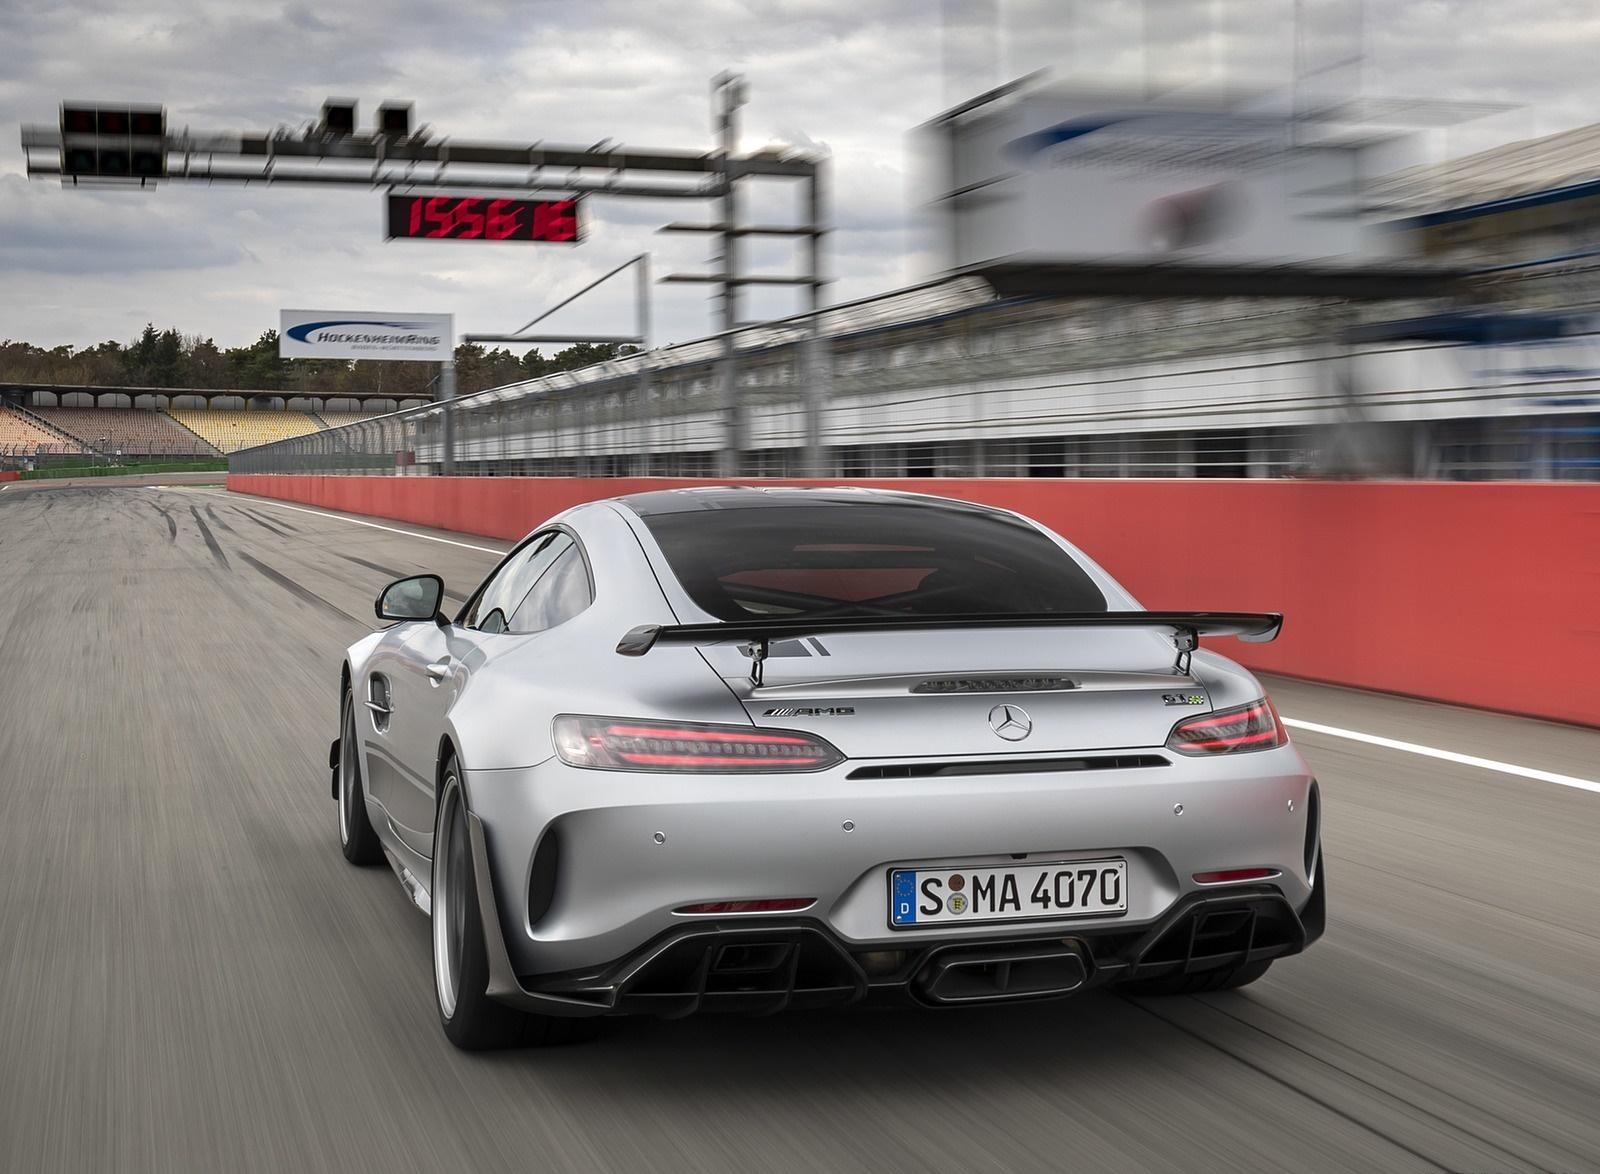 2020 Mercedes-AMG GT R Pro (Color: Designo Iridium Silver magno) Rear Wallpapers (5)